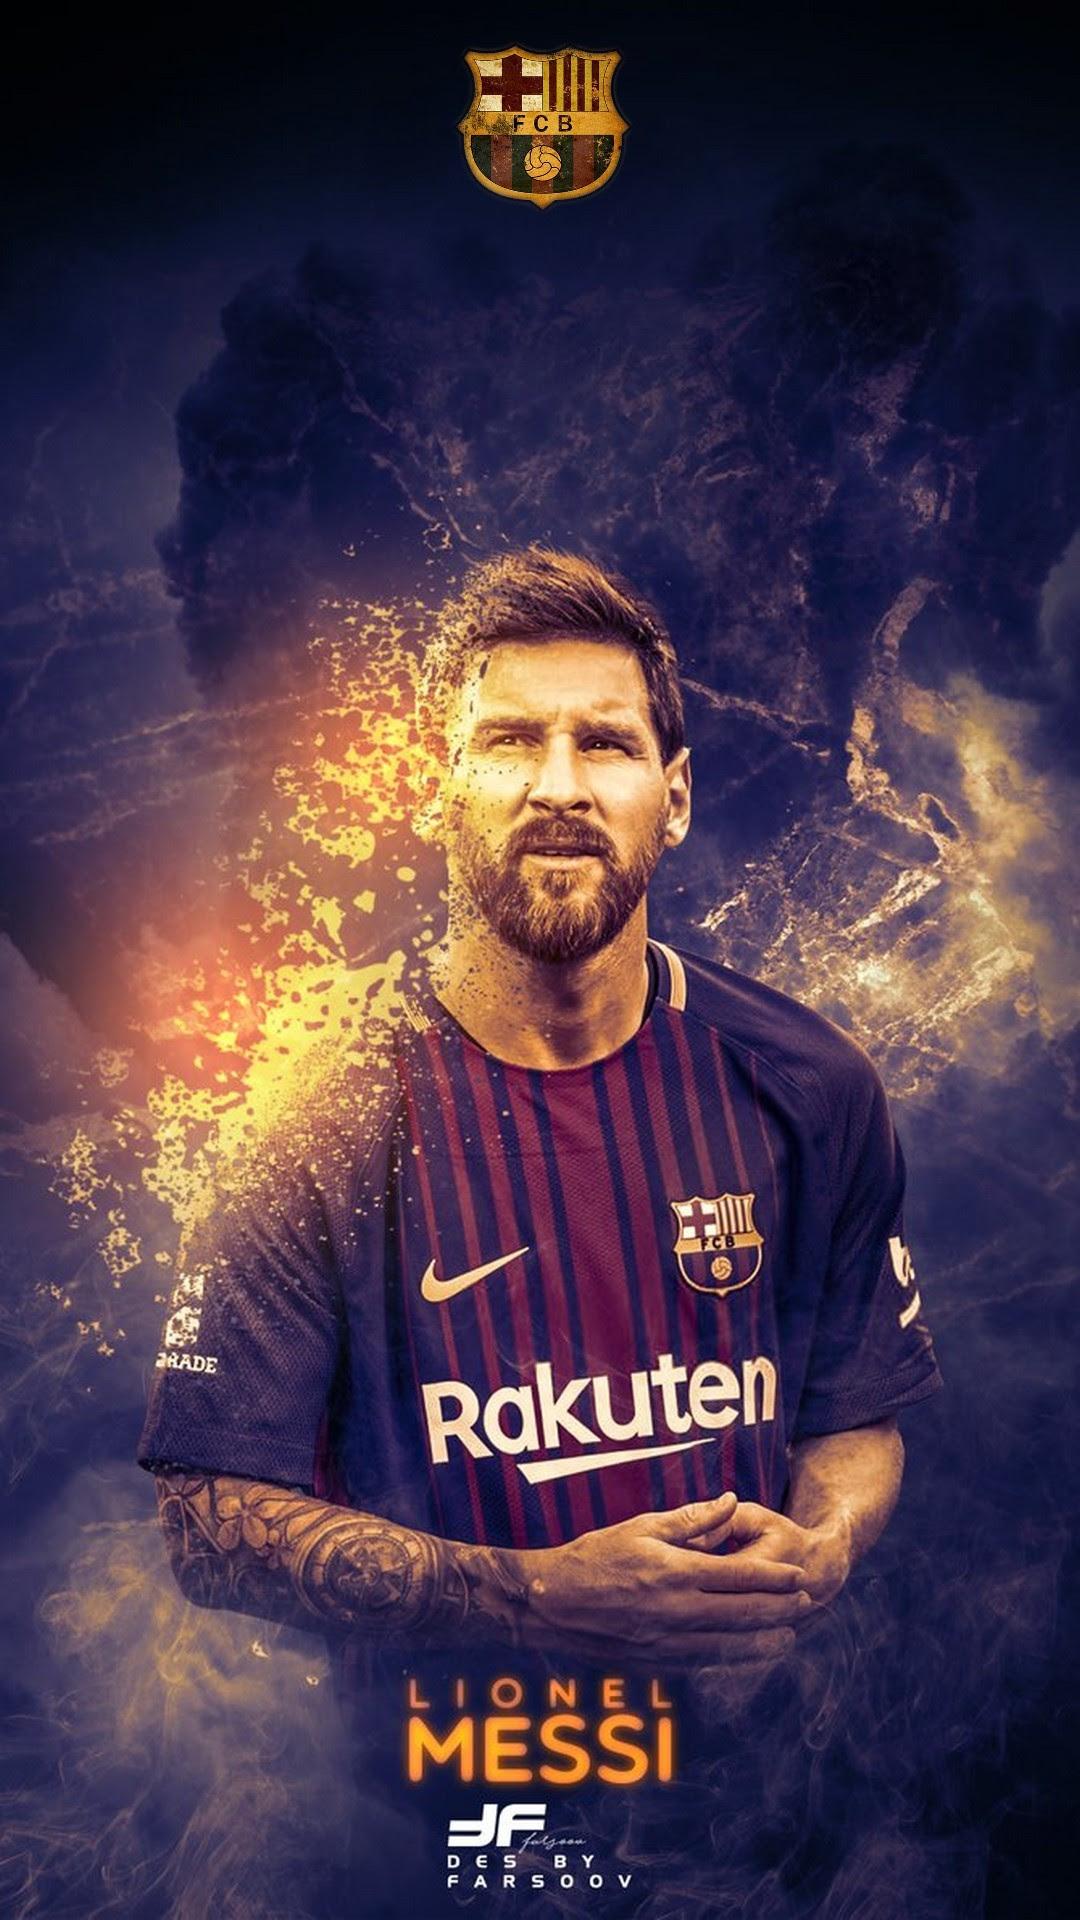 Leo Messi Hd Wallpaper For Iphone 2019 Football Wallpaper